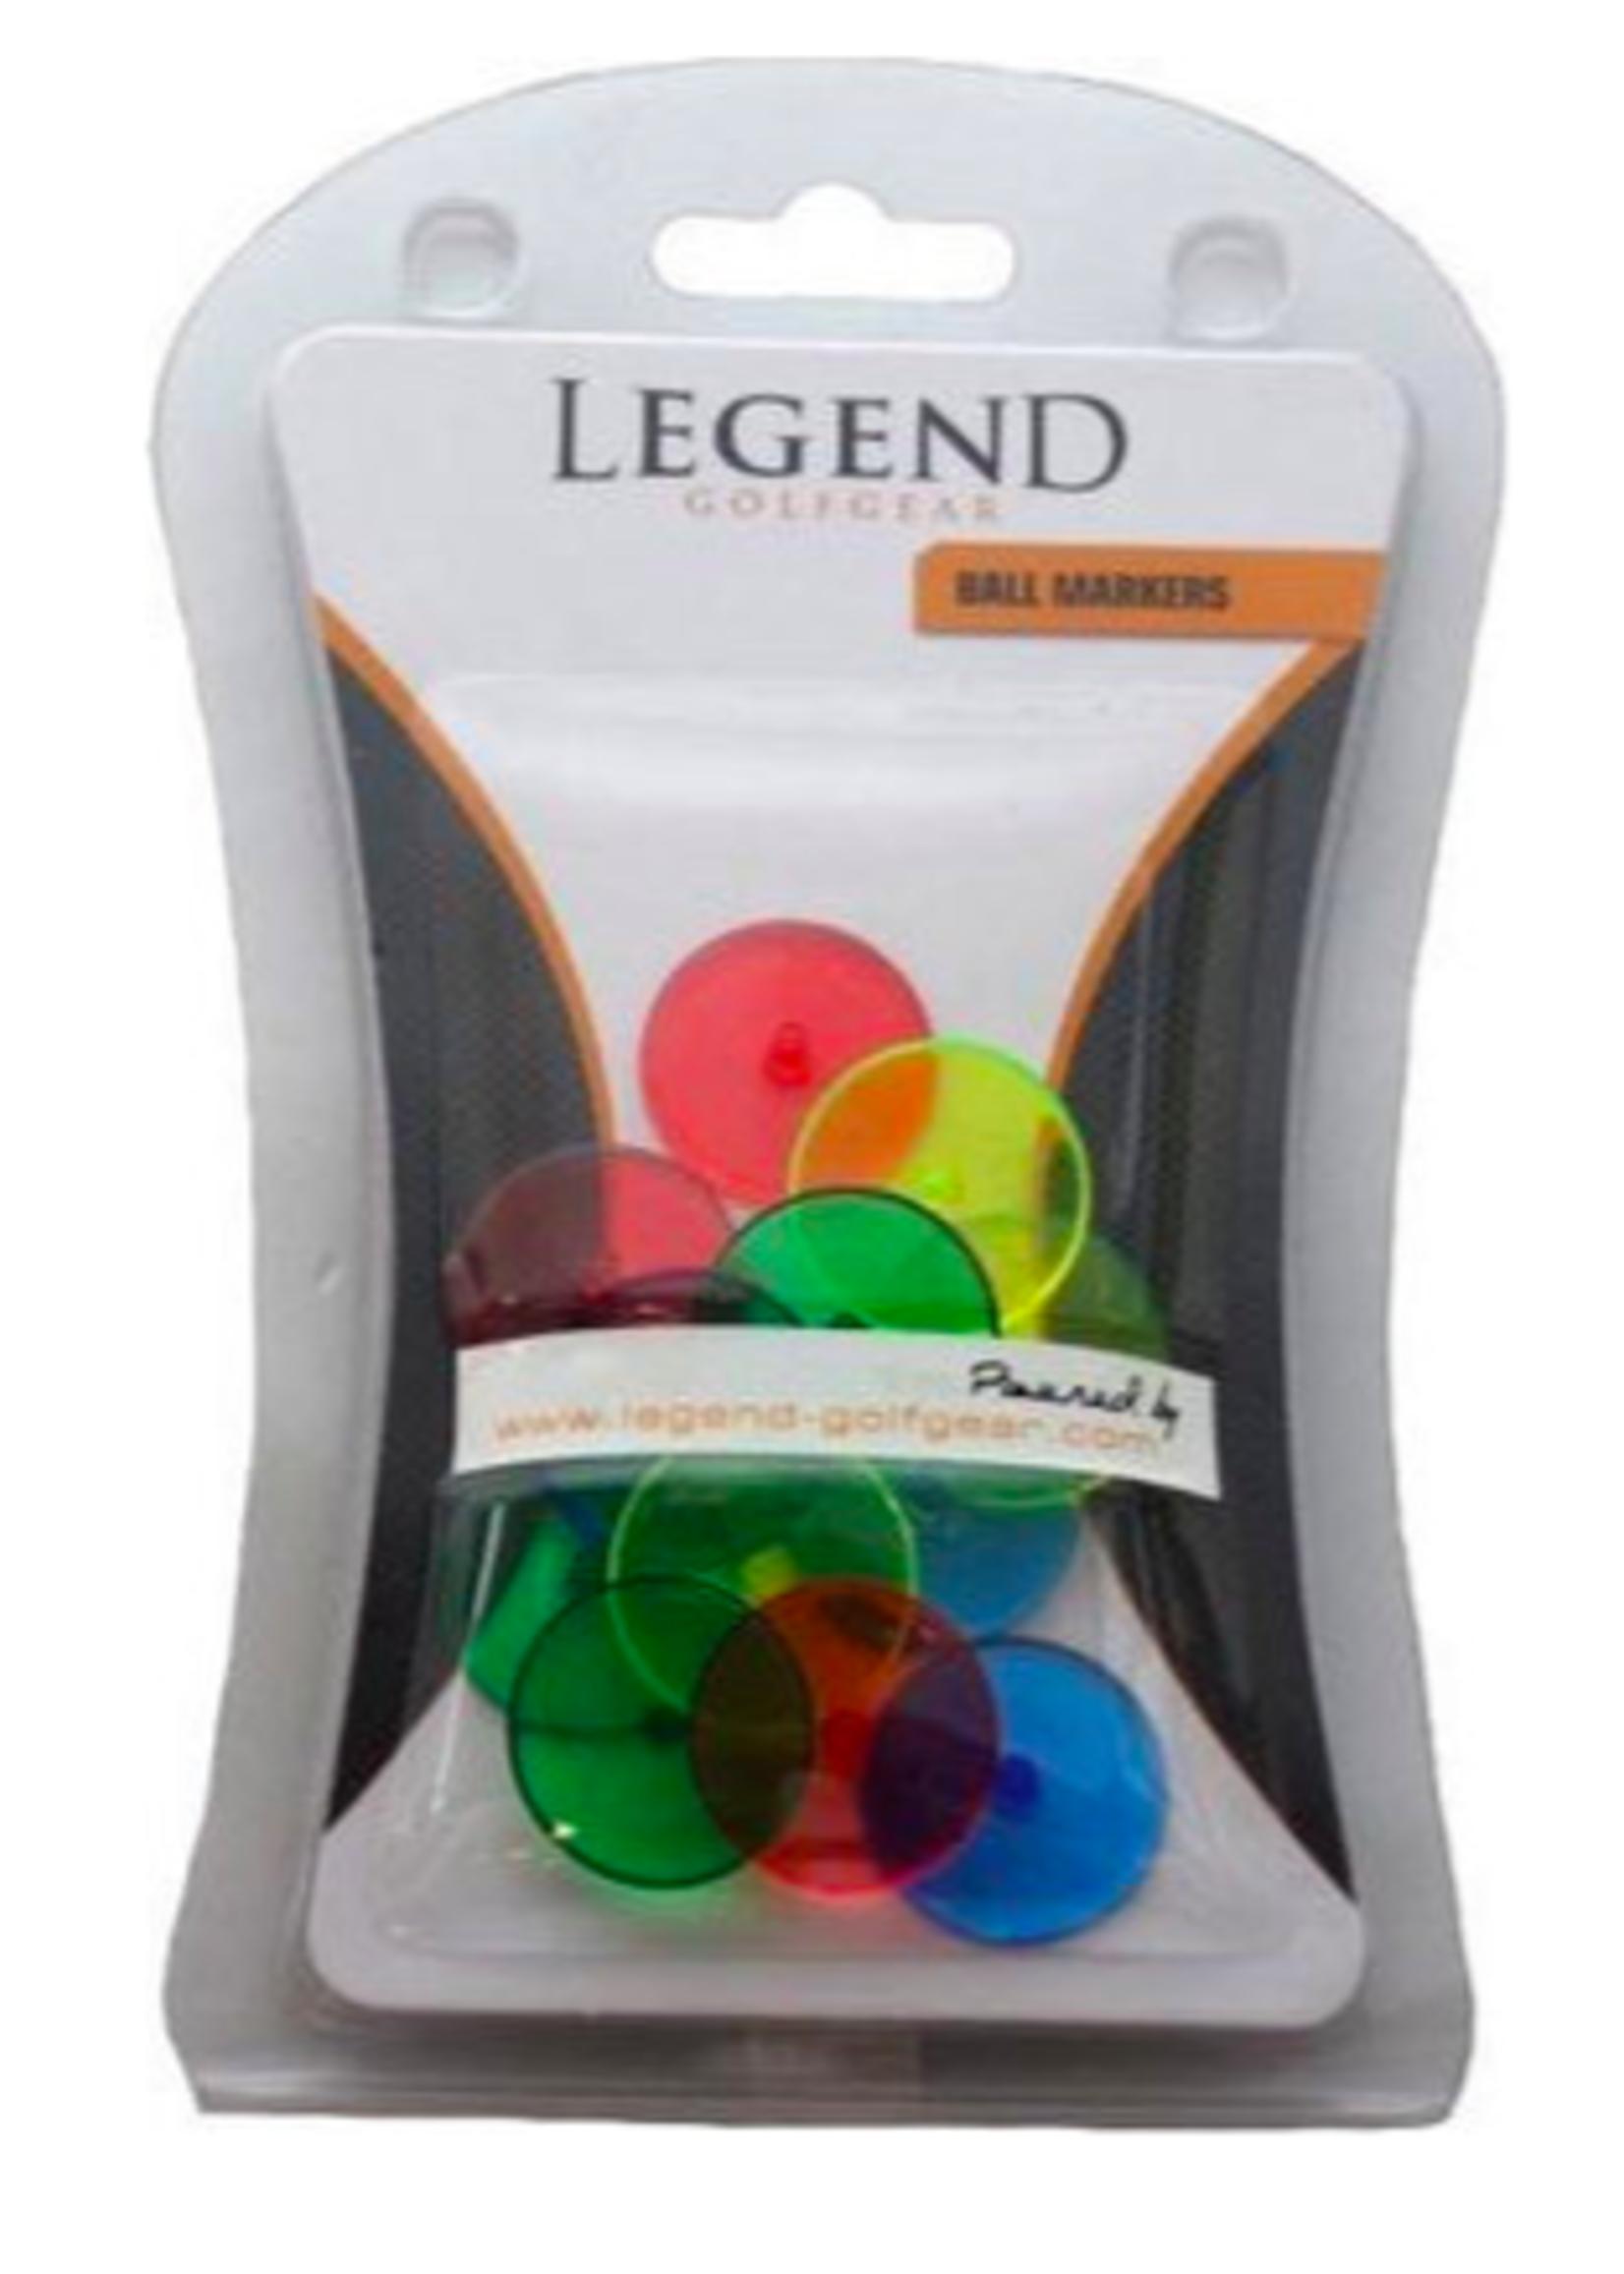 Legend 12 pcs Neon ball markers